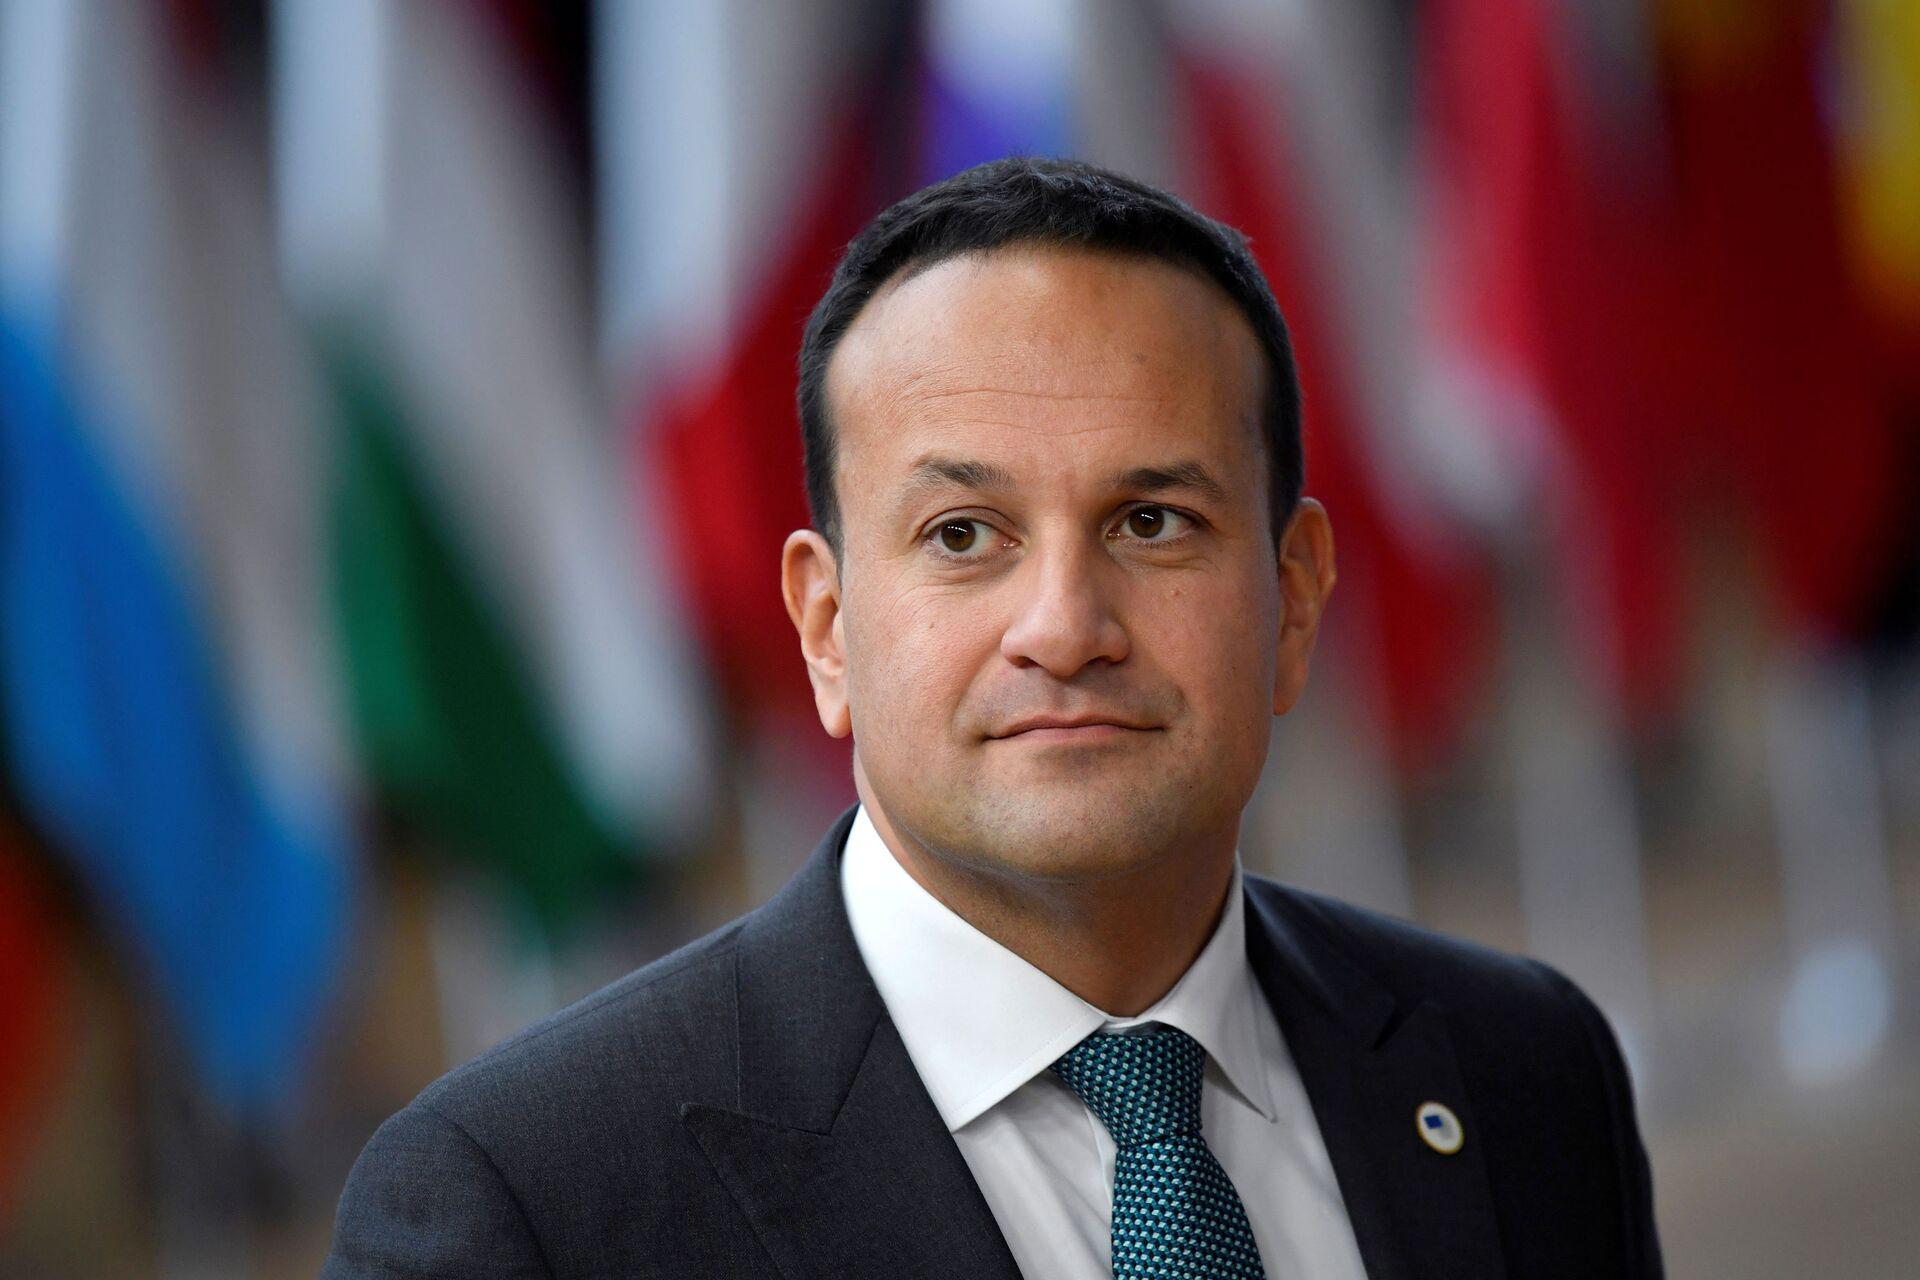 Ireland's Prime Minister (Taoiseach) Leo Varadkar  - Sputnik International, 1920, 07.09.2021